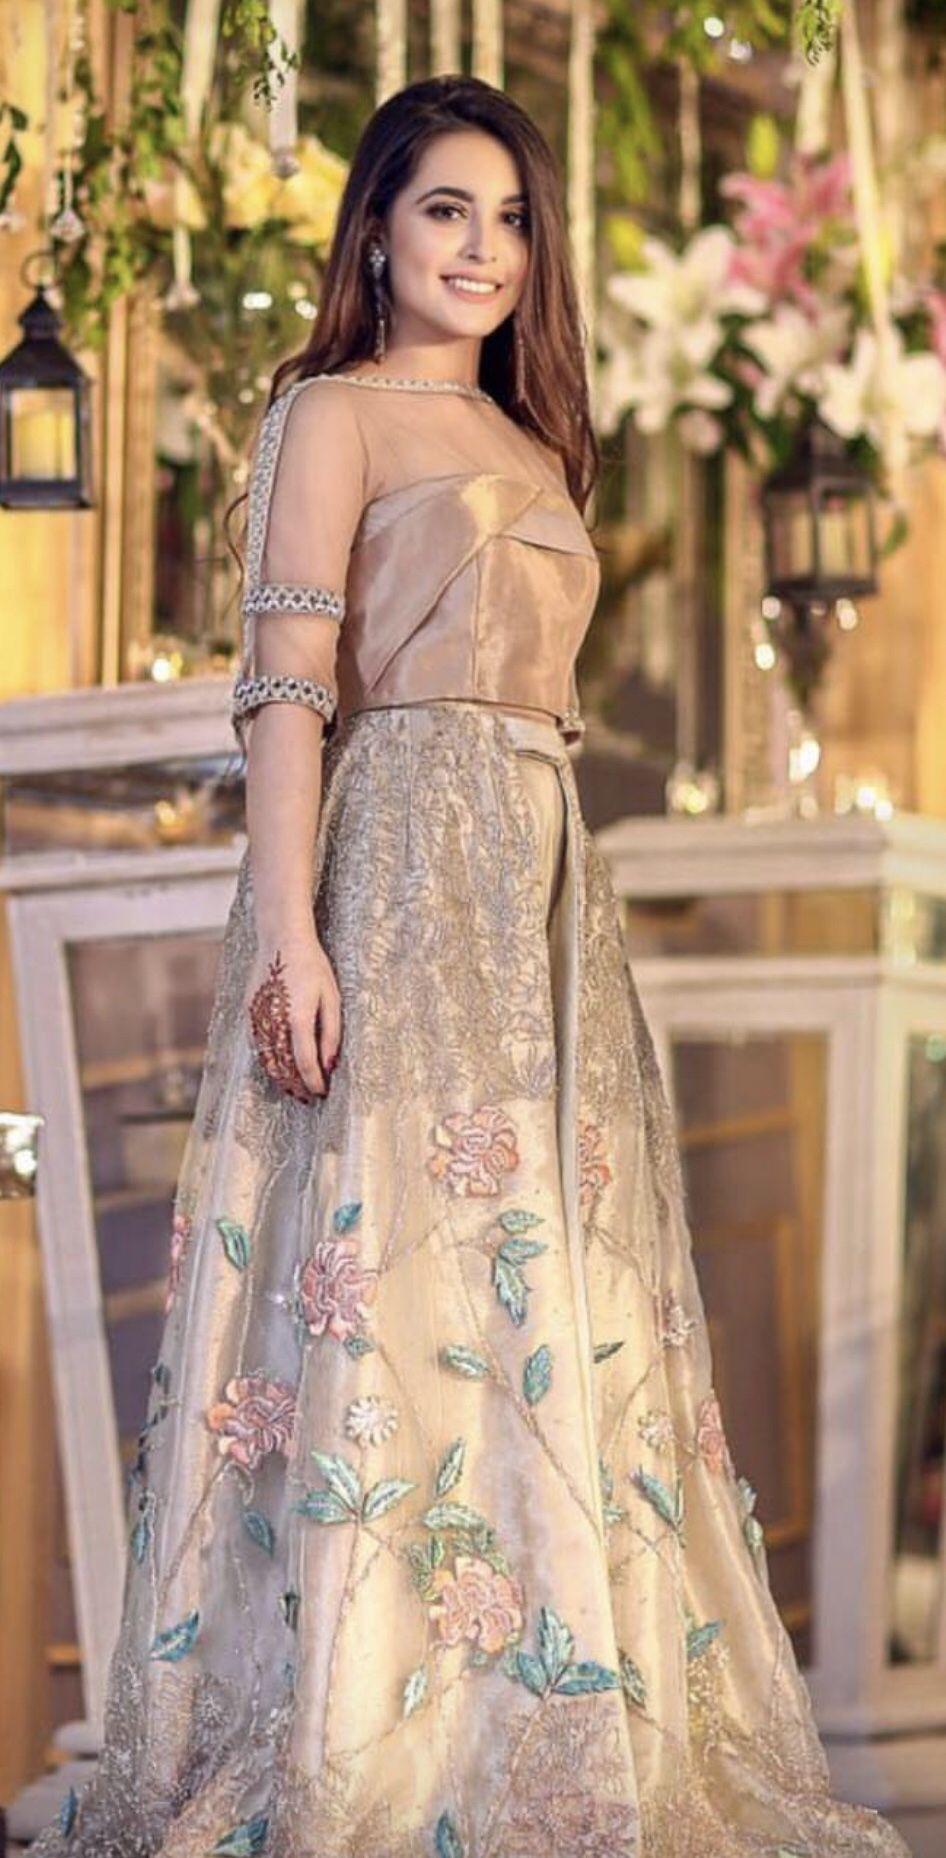 Baby Girl Dresses For Wedding In Pakistan Saddha